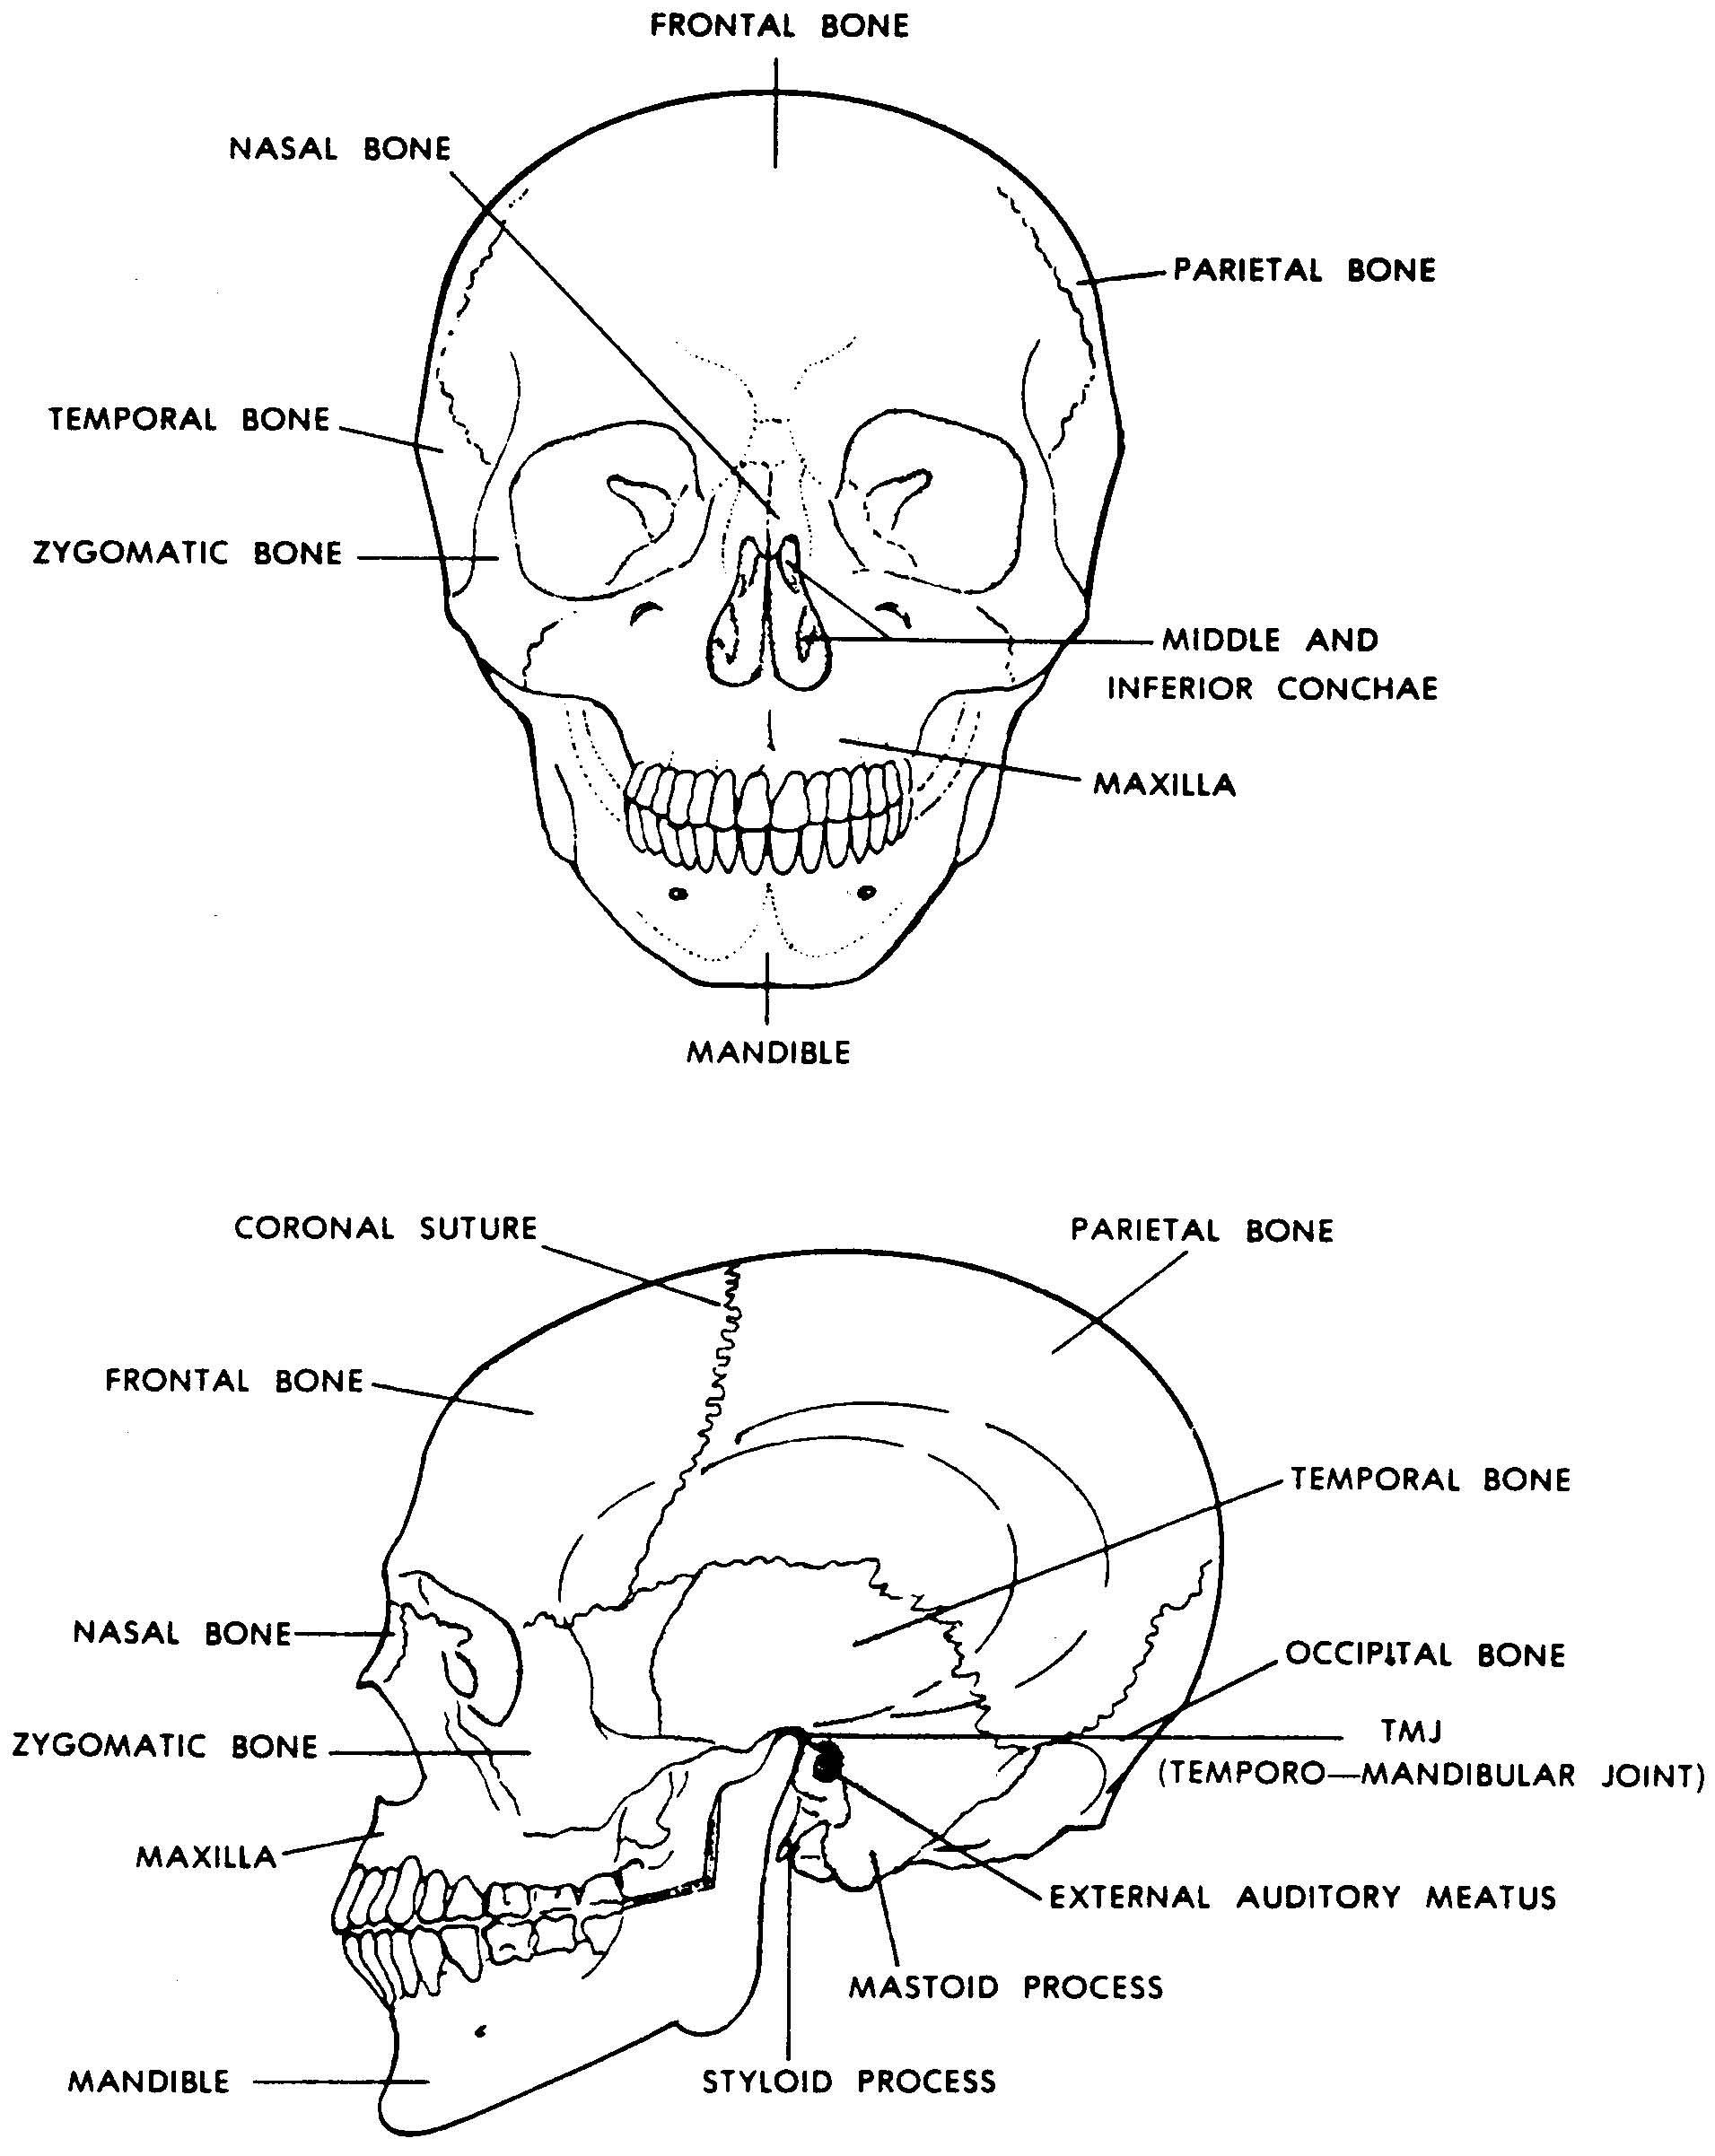 Biochemistry Class Notes Cardiac Anatomy Basic Manual Guide